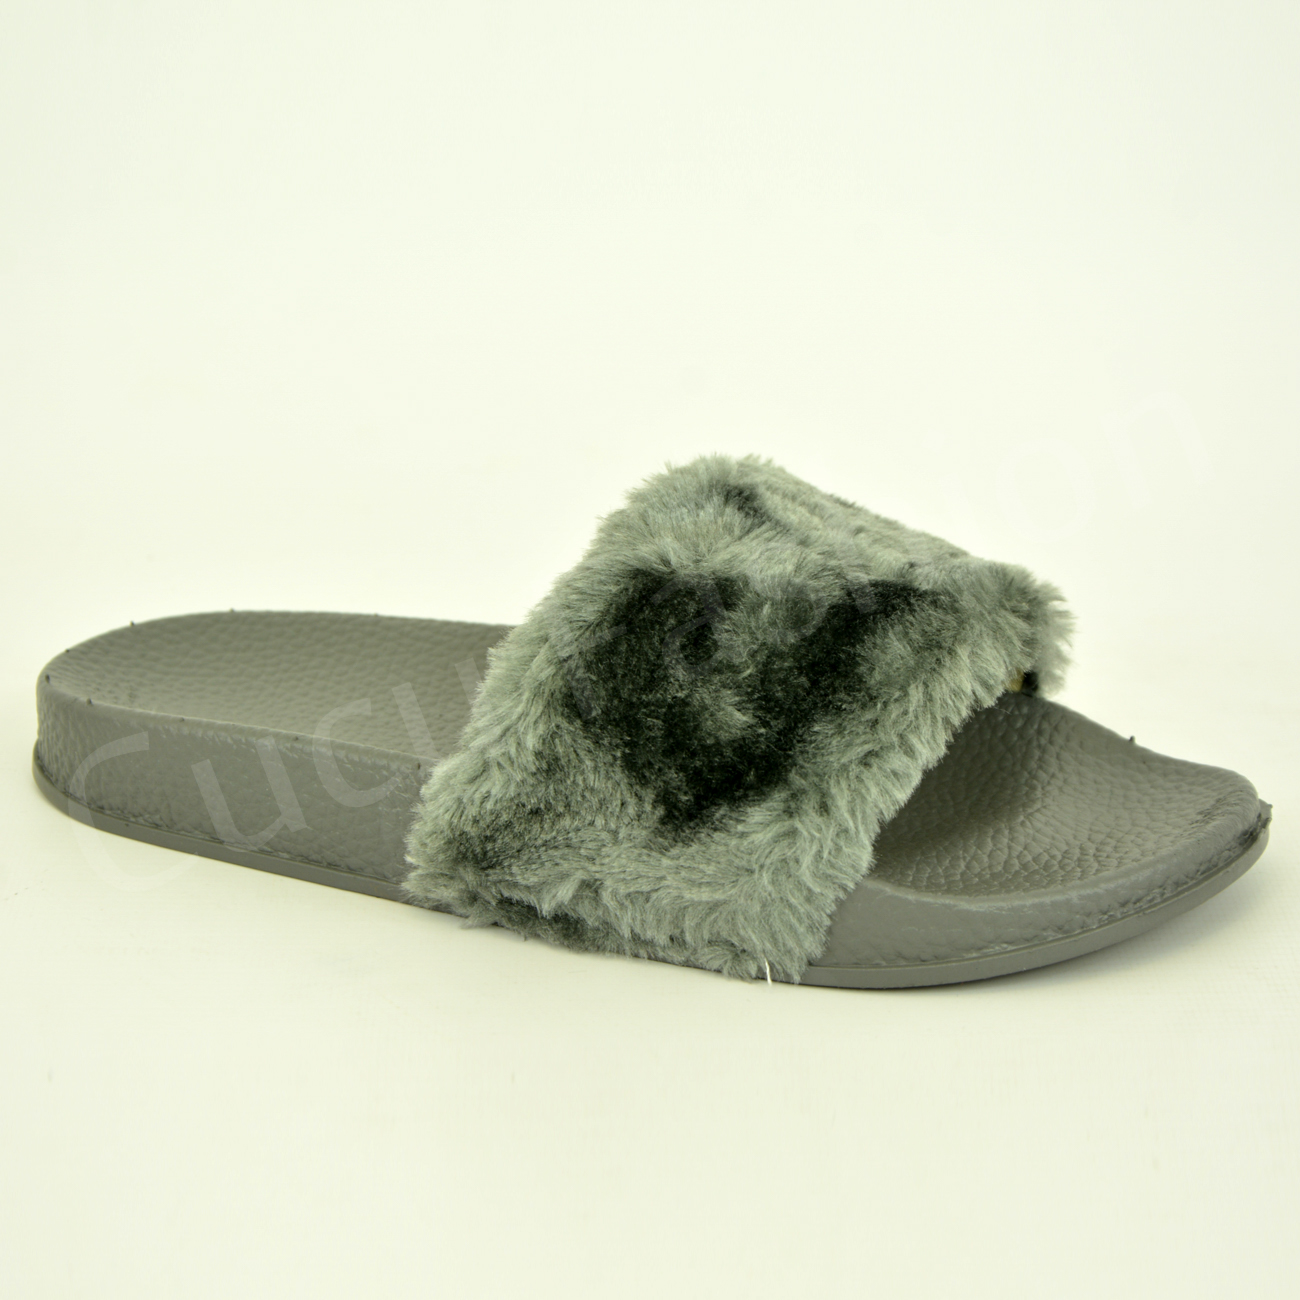 08ac67ee3f1b Justin Furry Flip Flop Slippers